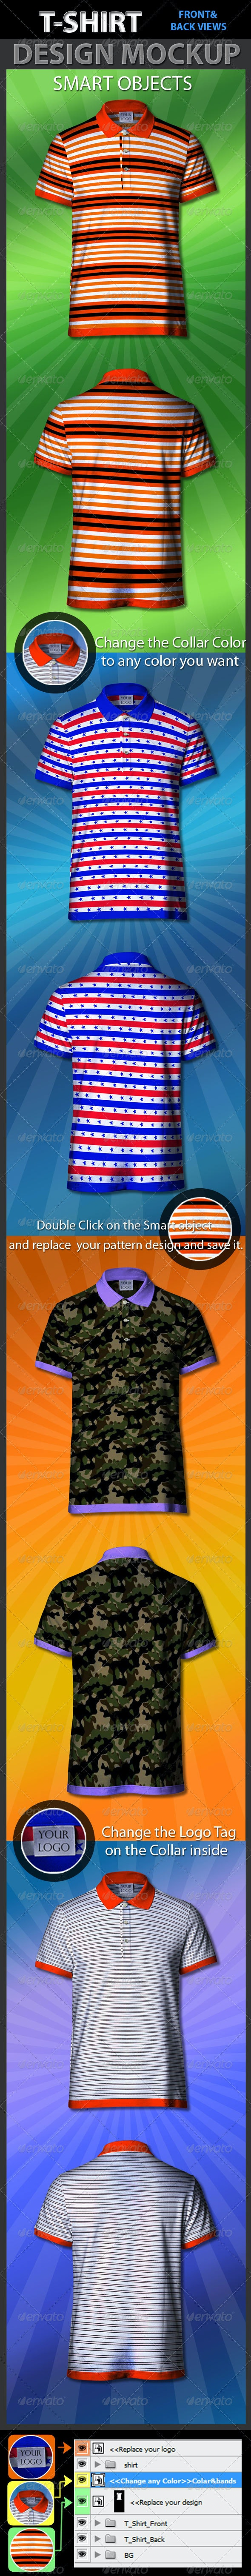 Tshirt Design Front & Back Mockup  - T-shirts Apparel